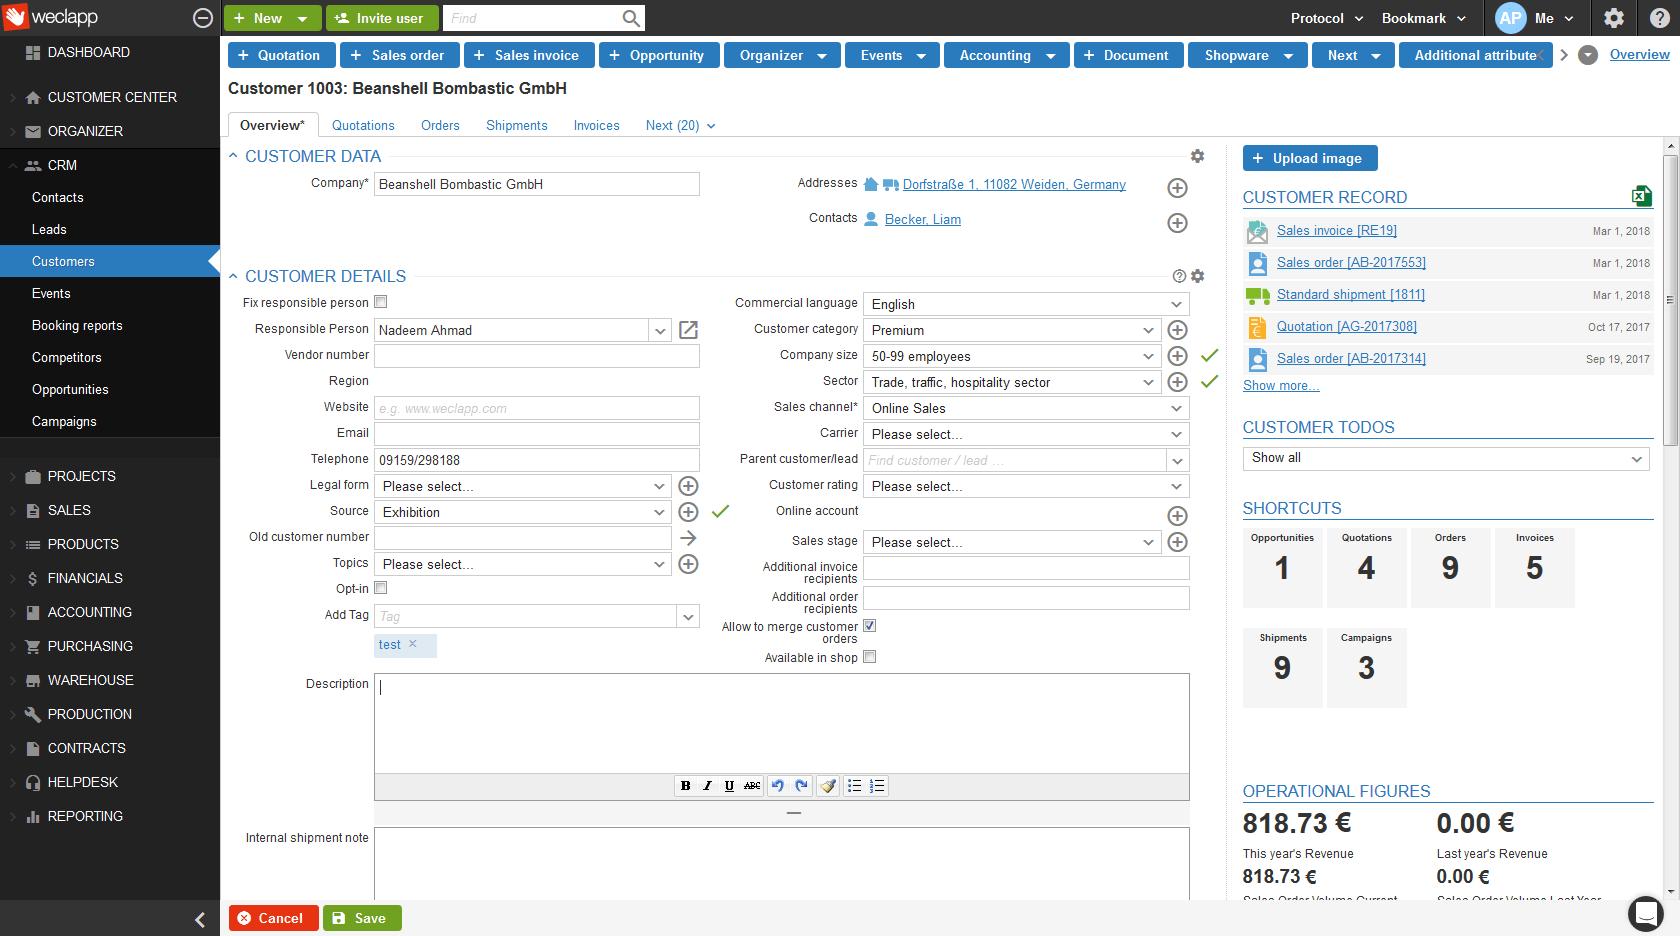 Recording customer details in Weclapp Cloud CRM